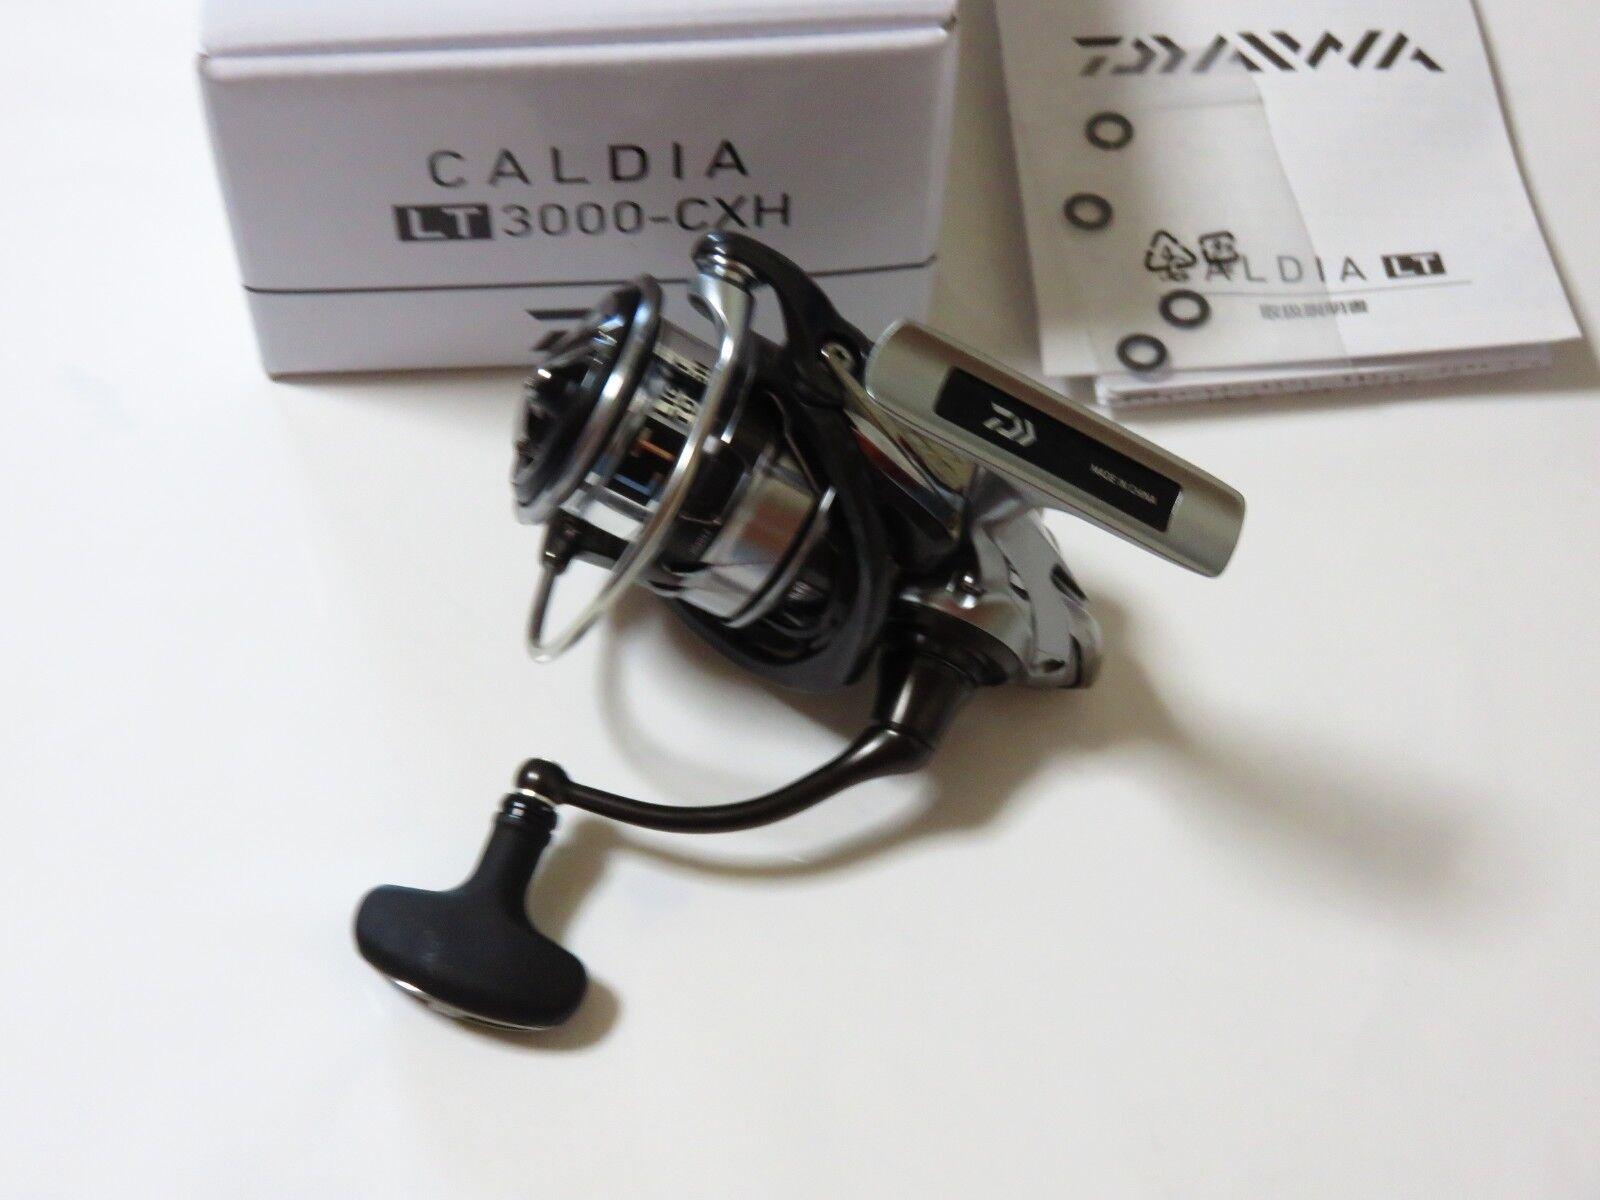 Daiwa 18 CALDIA LT3000-CXH Spinning Reel LIGHT TOUGH ABS II New